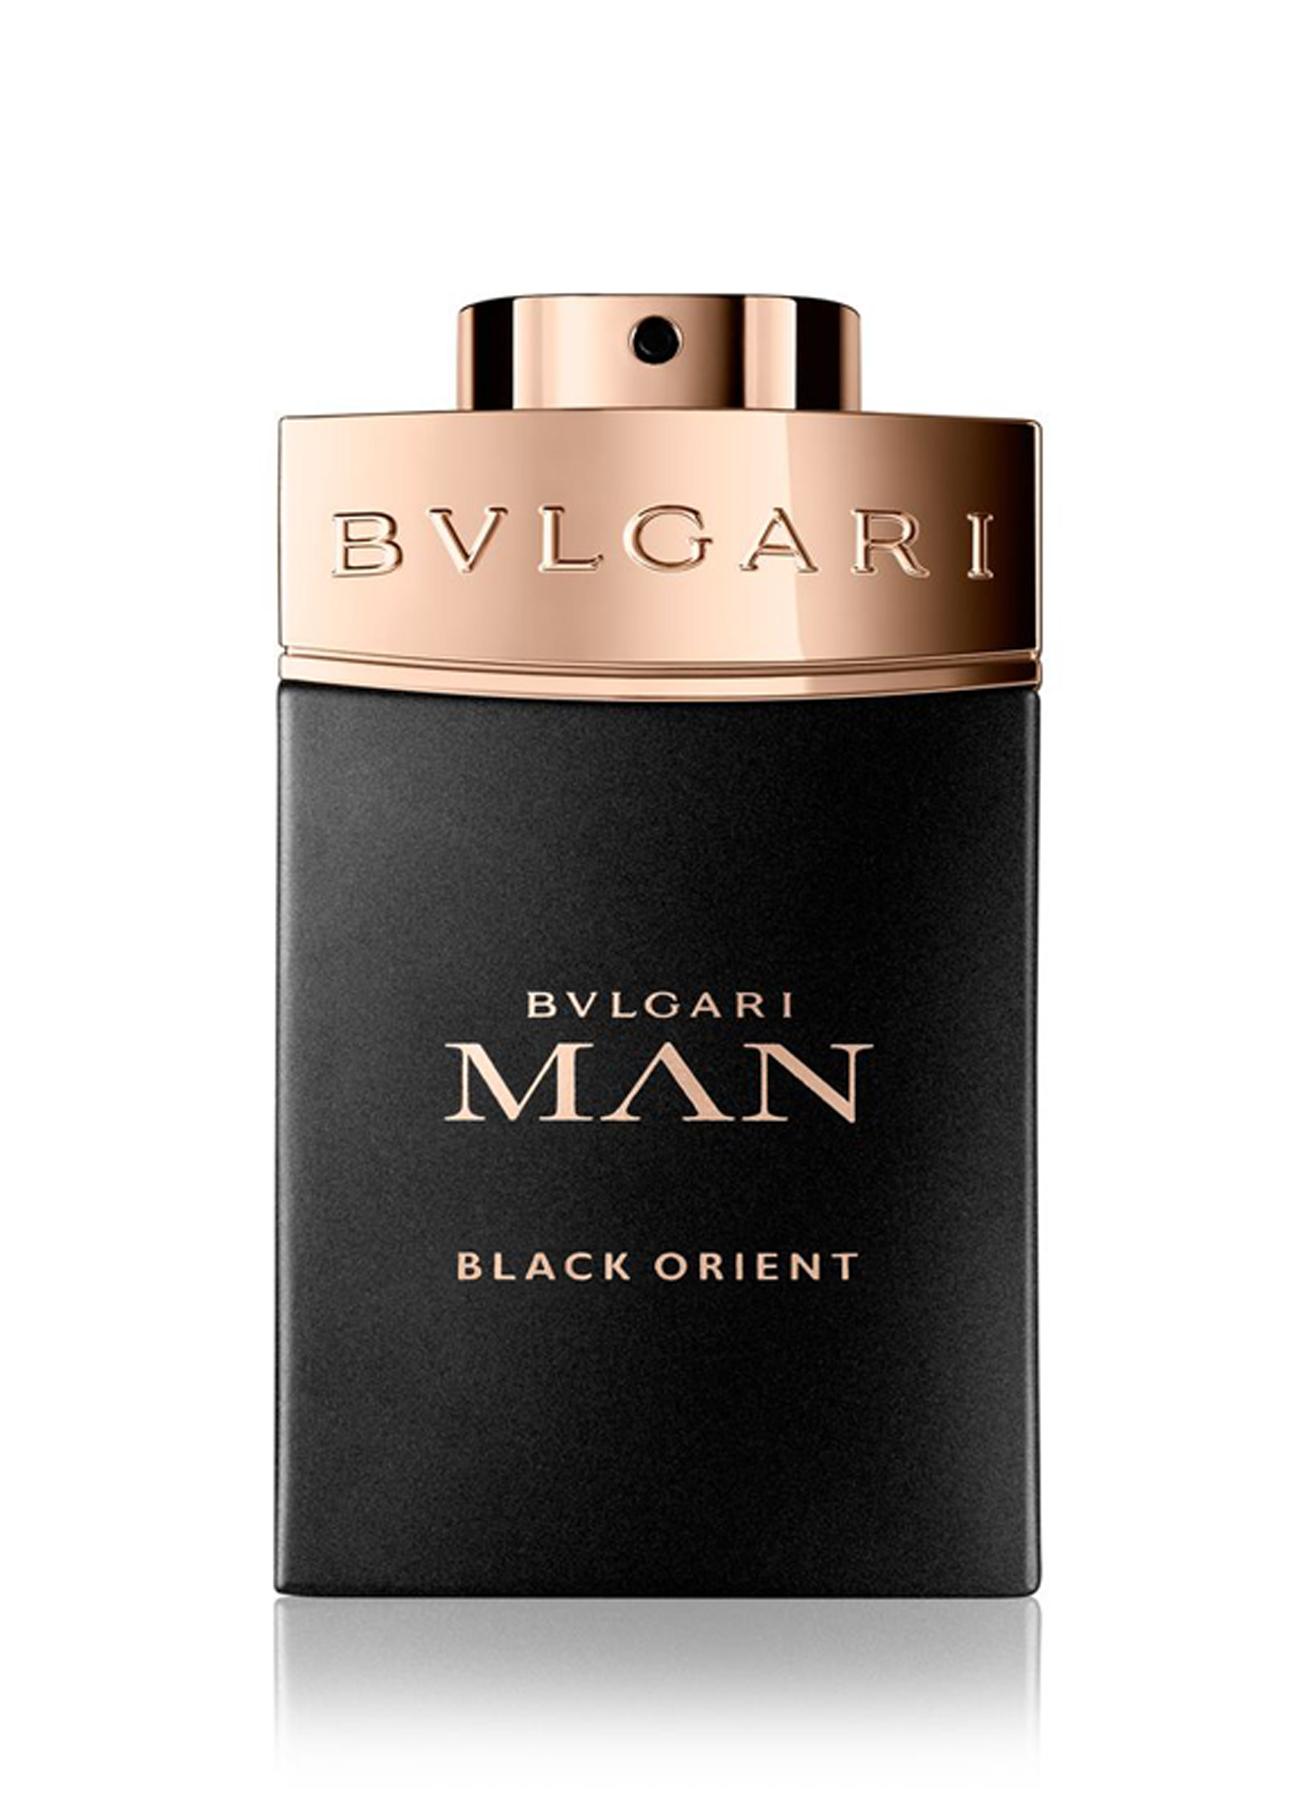 Bvlgari Black Orient Edt 100 ml Erkek Parfüm 5000136523001 Ürün Resmi